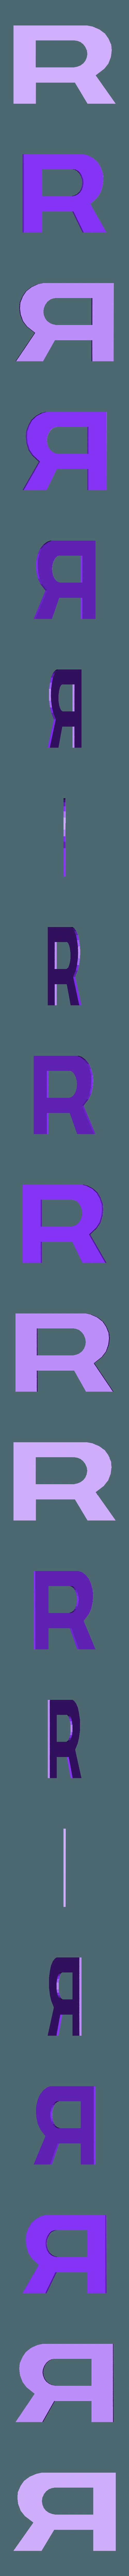 TAPA R.stl Download free STL file LUMINOUS LED NAME - SEA • 3D printable design, cristotier